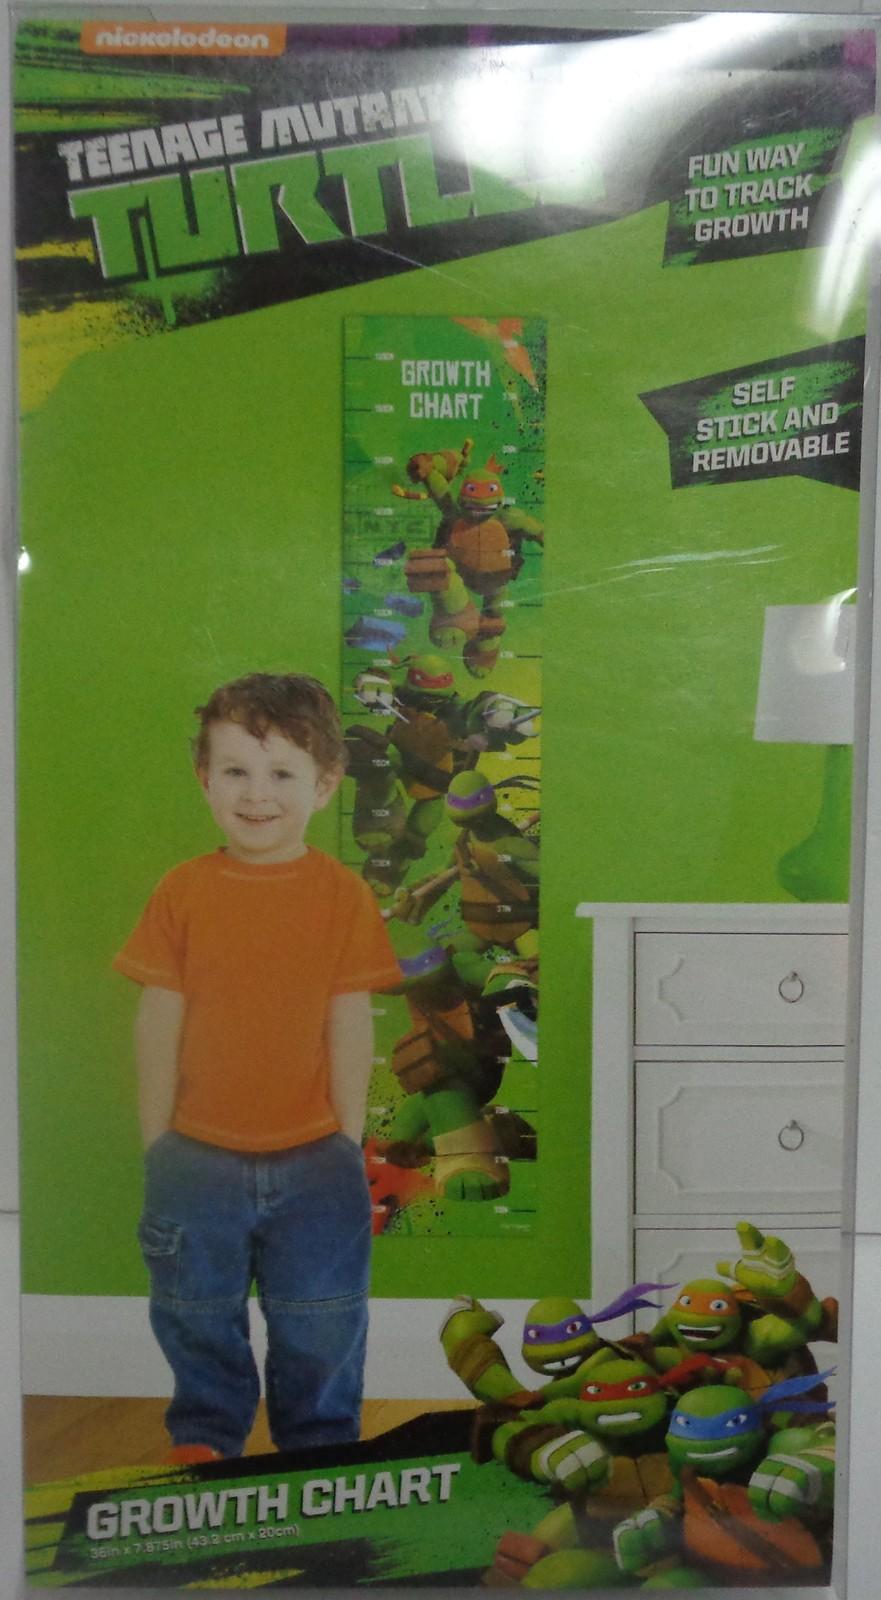 Nickelodeon Teenage Mutant Ninja Turtles Growth Chart NIB Self Stick & Remove